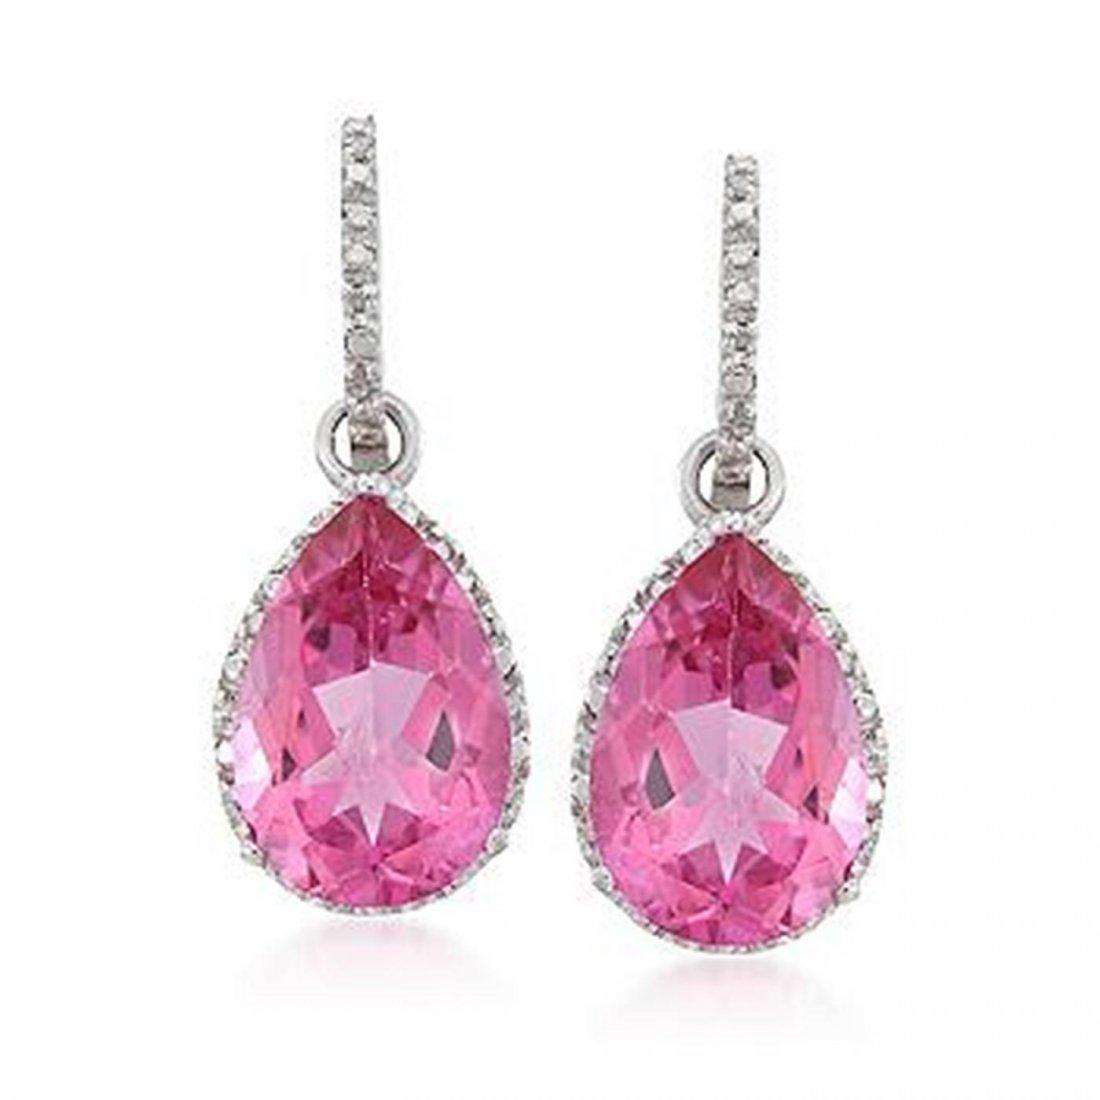 13.00 ct. t.w. Pink Topaz and .12 ct. t.w. Diamond Earr